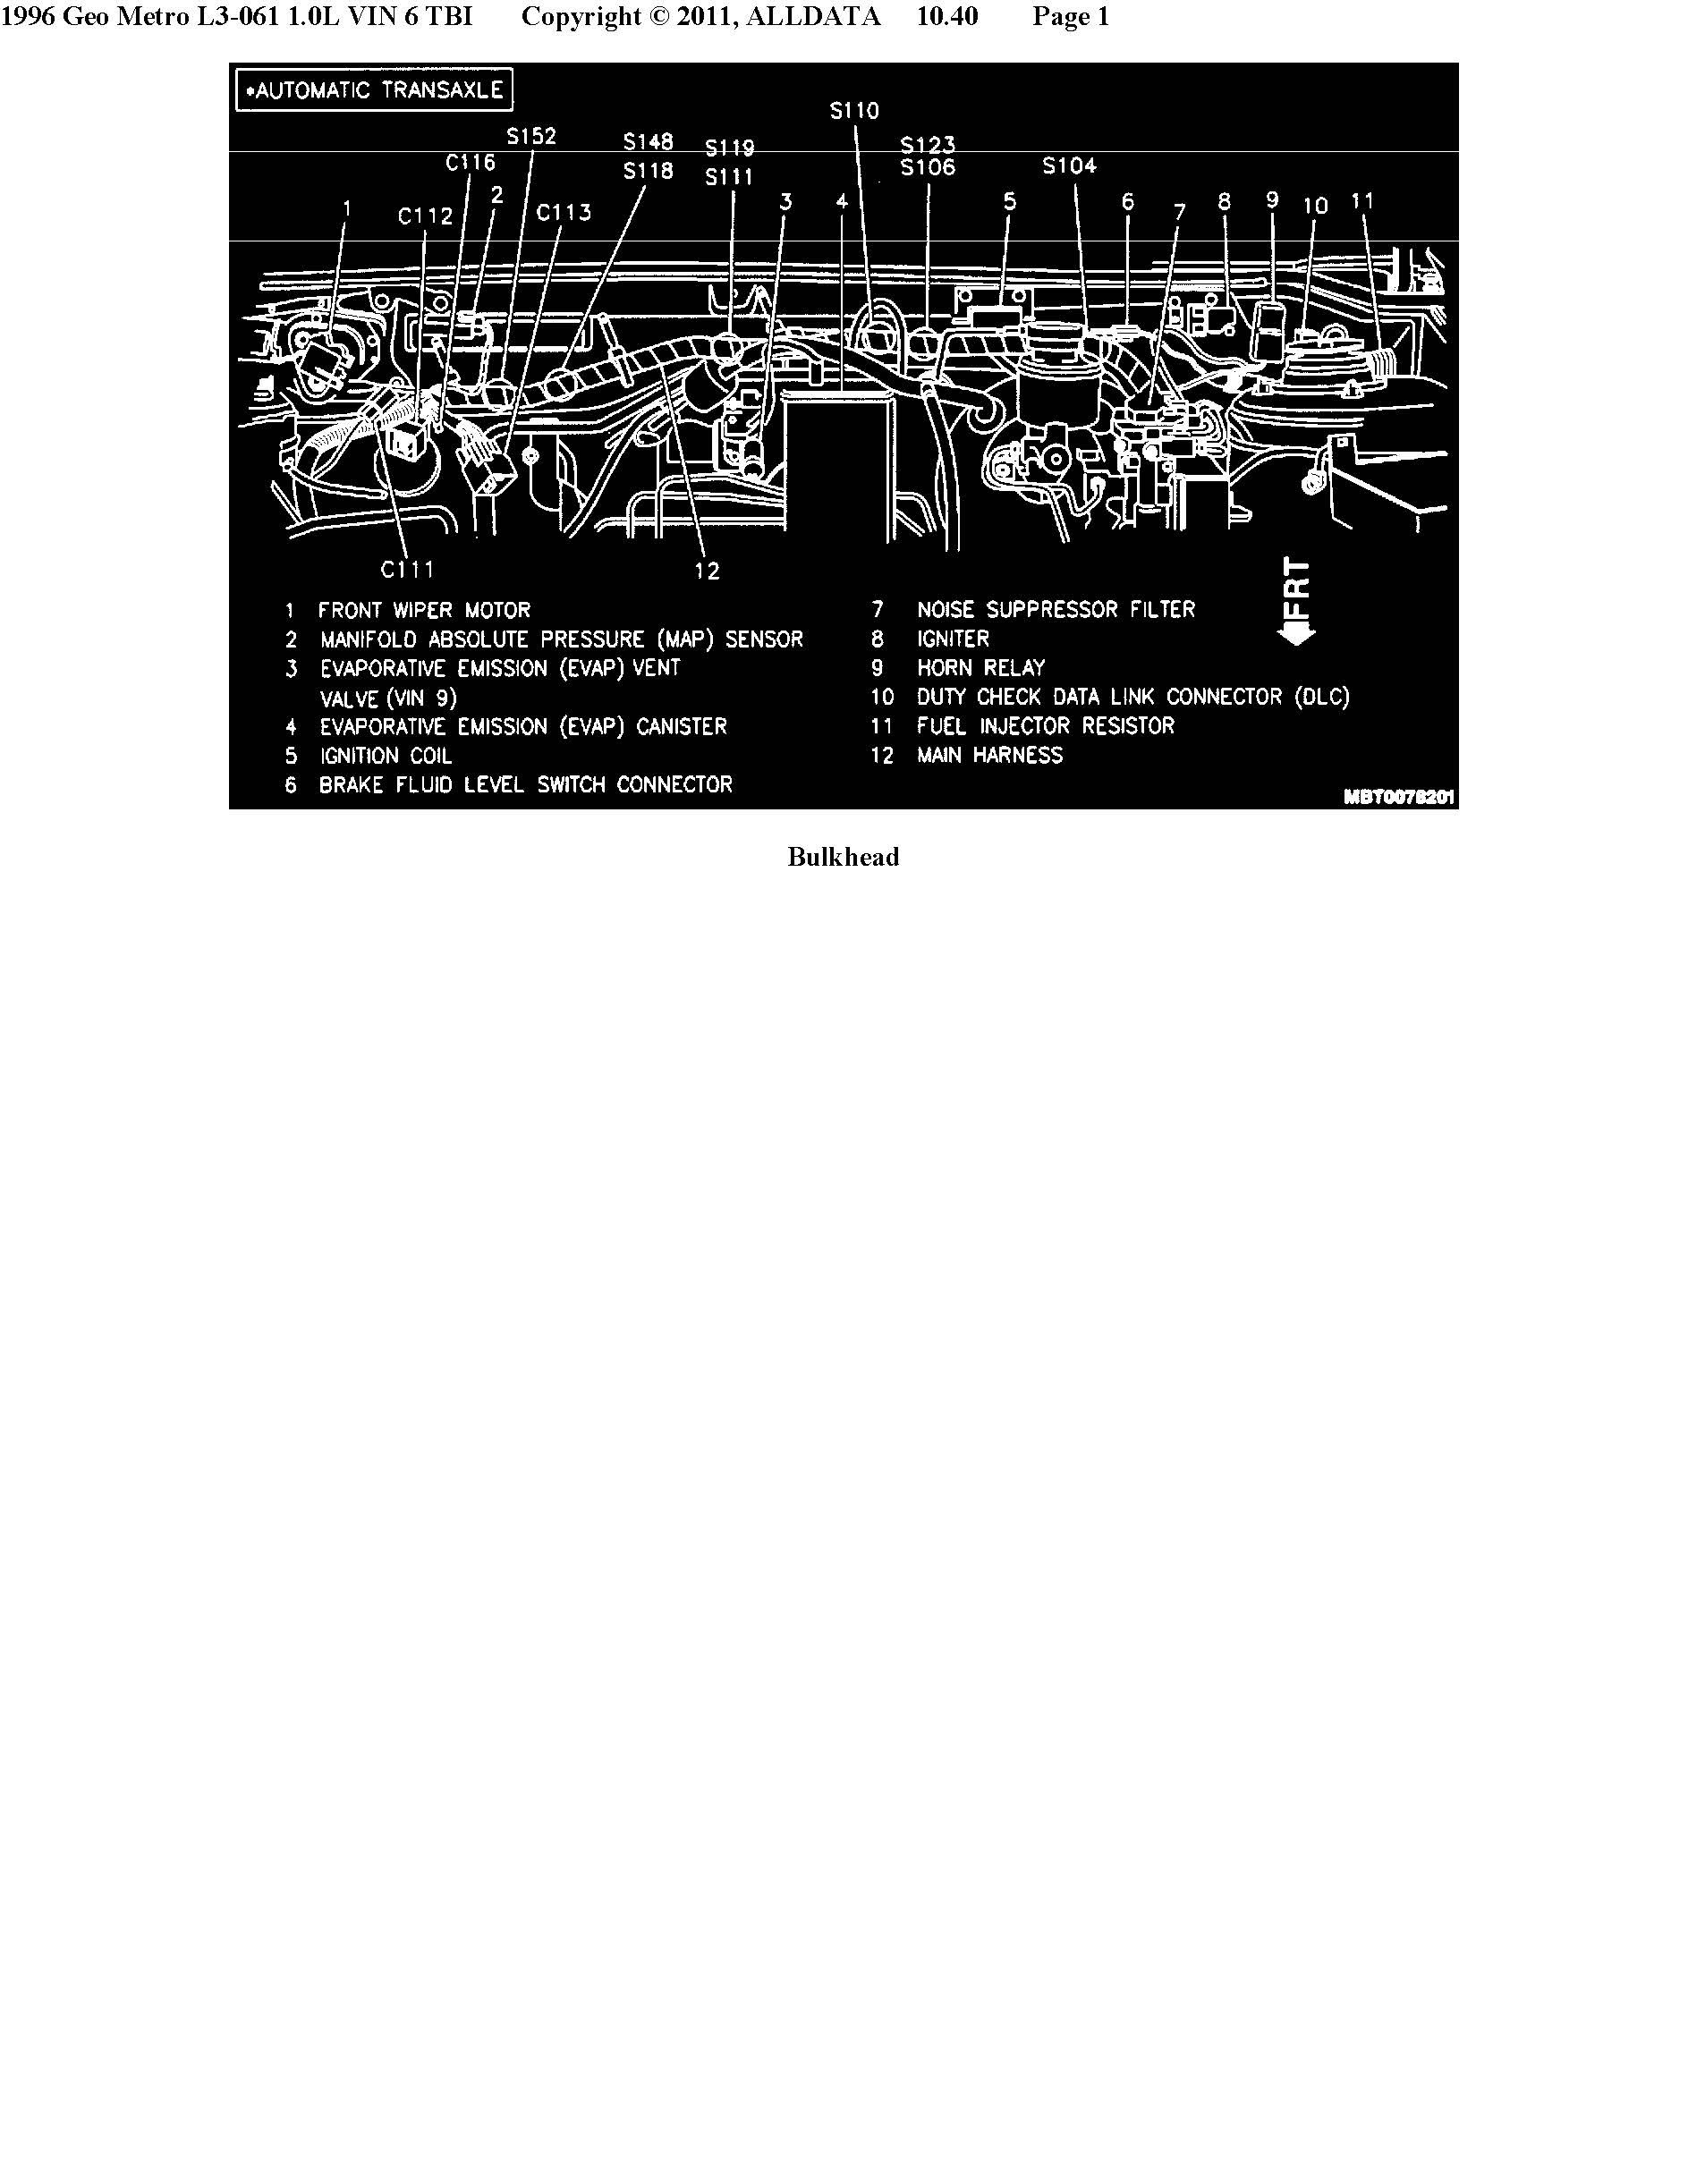 95 Prizm Fuse Box Diagram Manual Of Wiring 1992 Geo Storm For Metro Honda Civic Interior